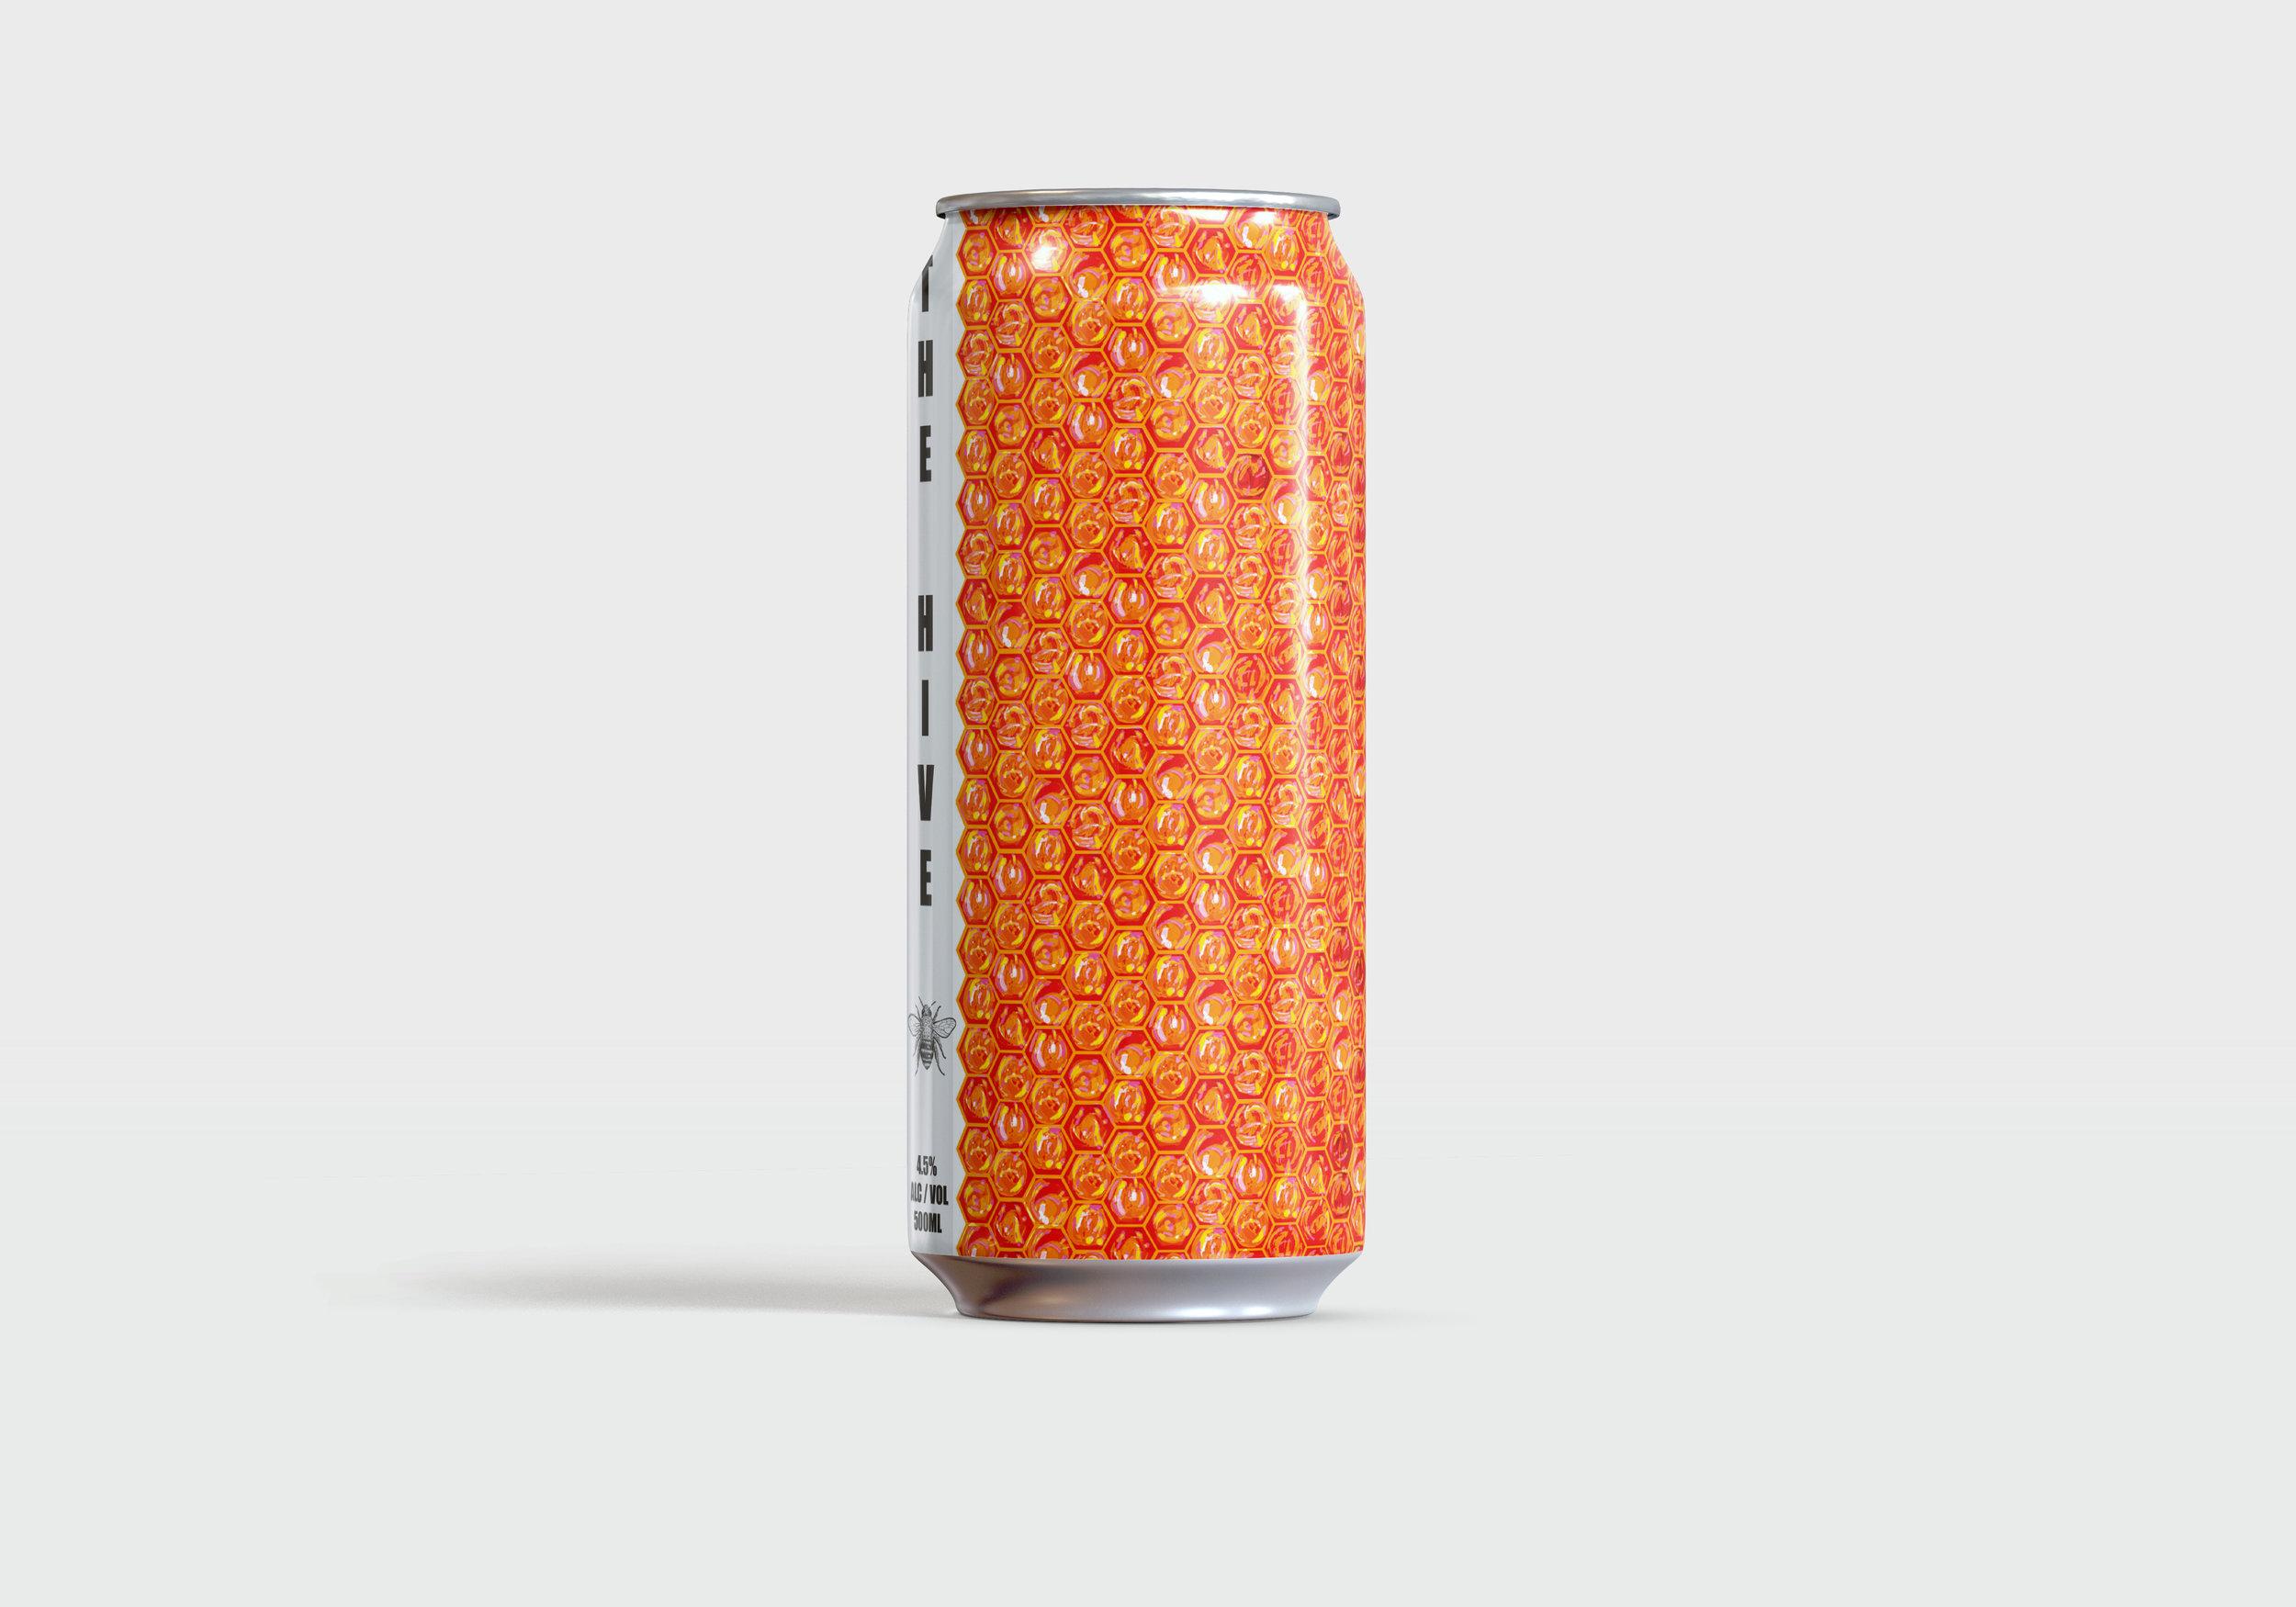 New England Brewing Co. // Packaging design // Sydney, Australia